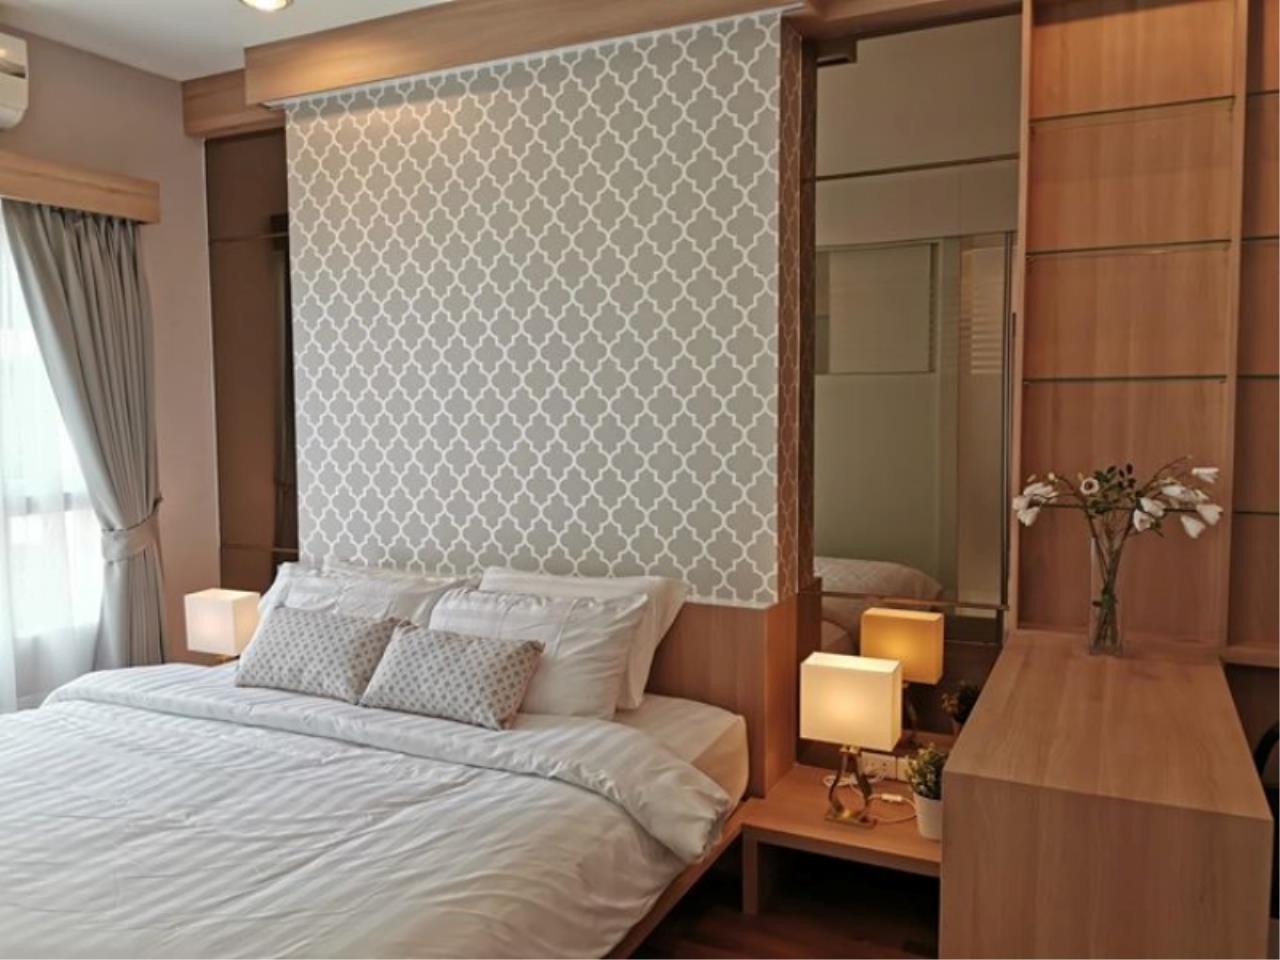 Century21 Skylux Agency's Q. House Condo Sathorn / Condo For Rent / 1 Bedroom / 47.2 SQM / BTS Krung Thon Buri / Bangkok 4